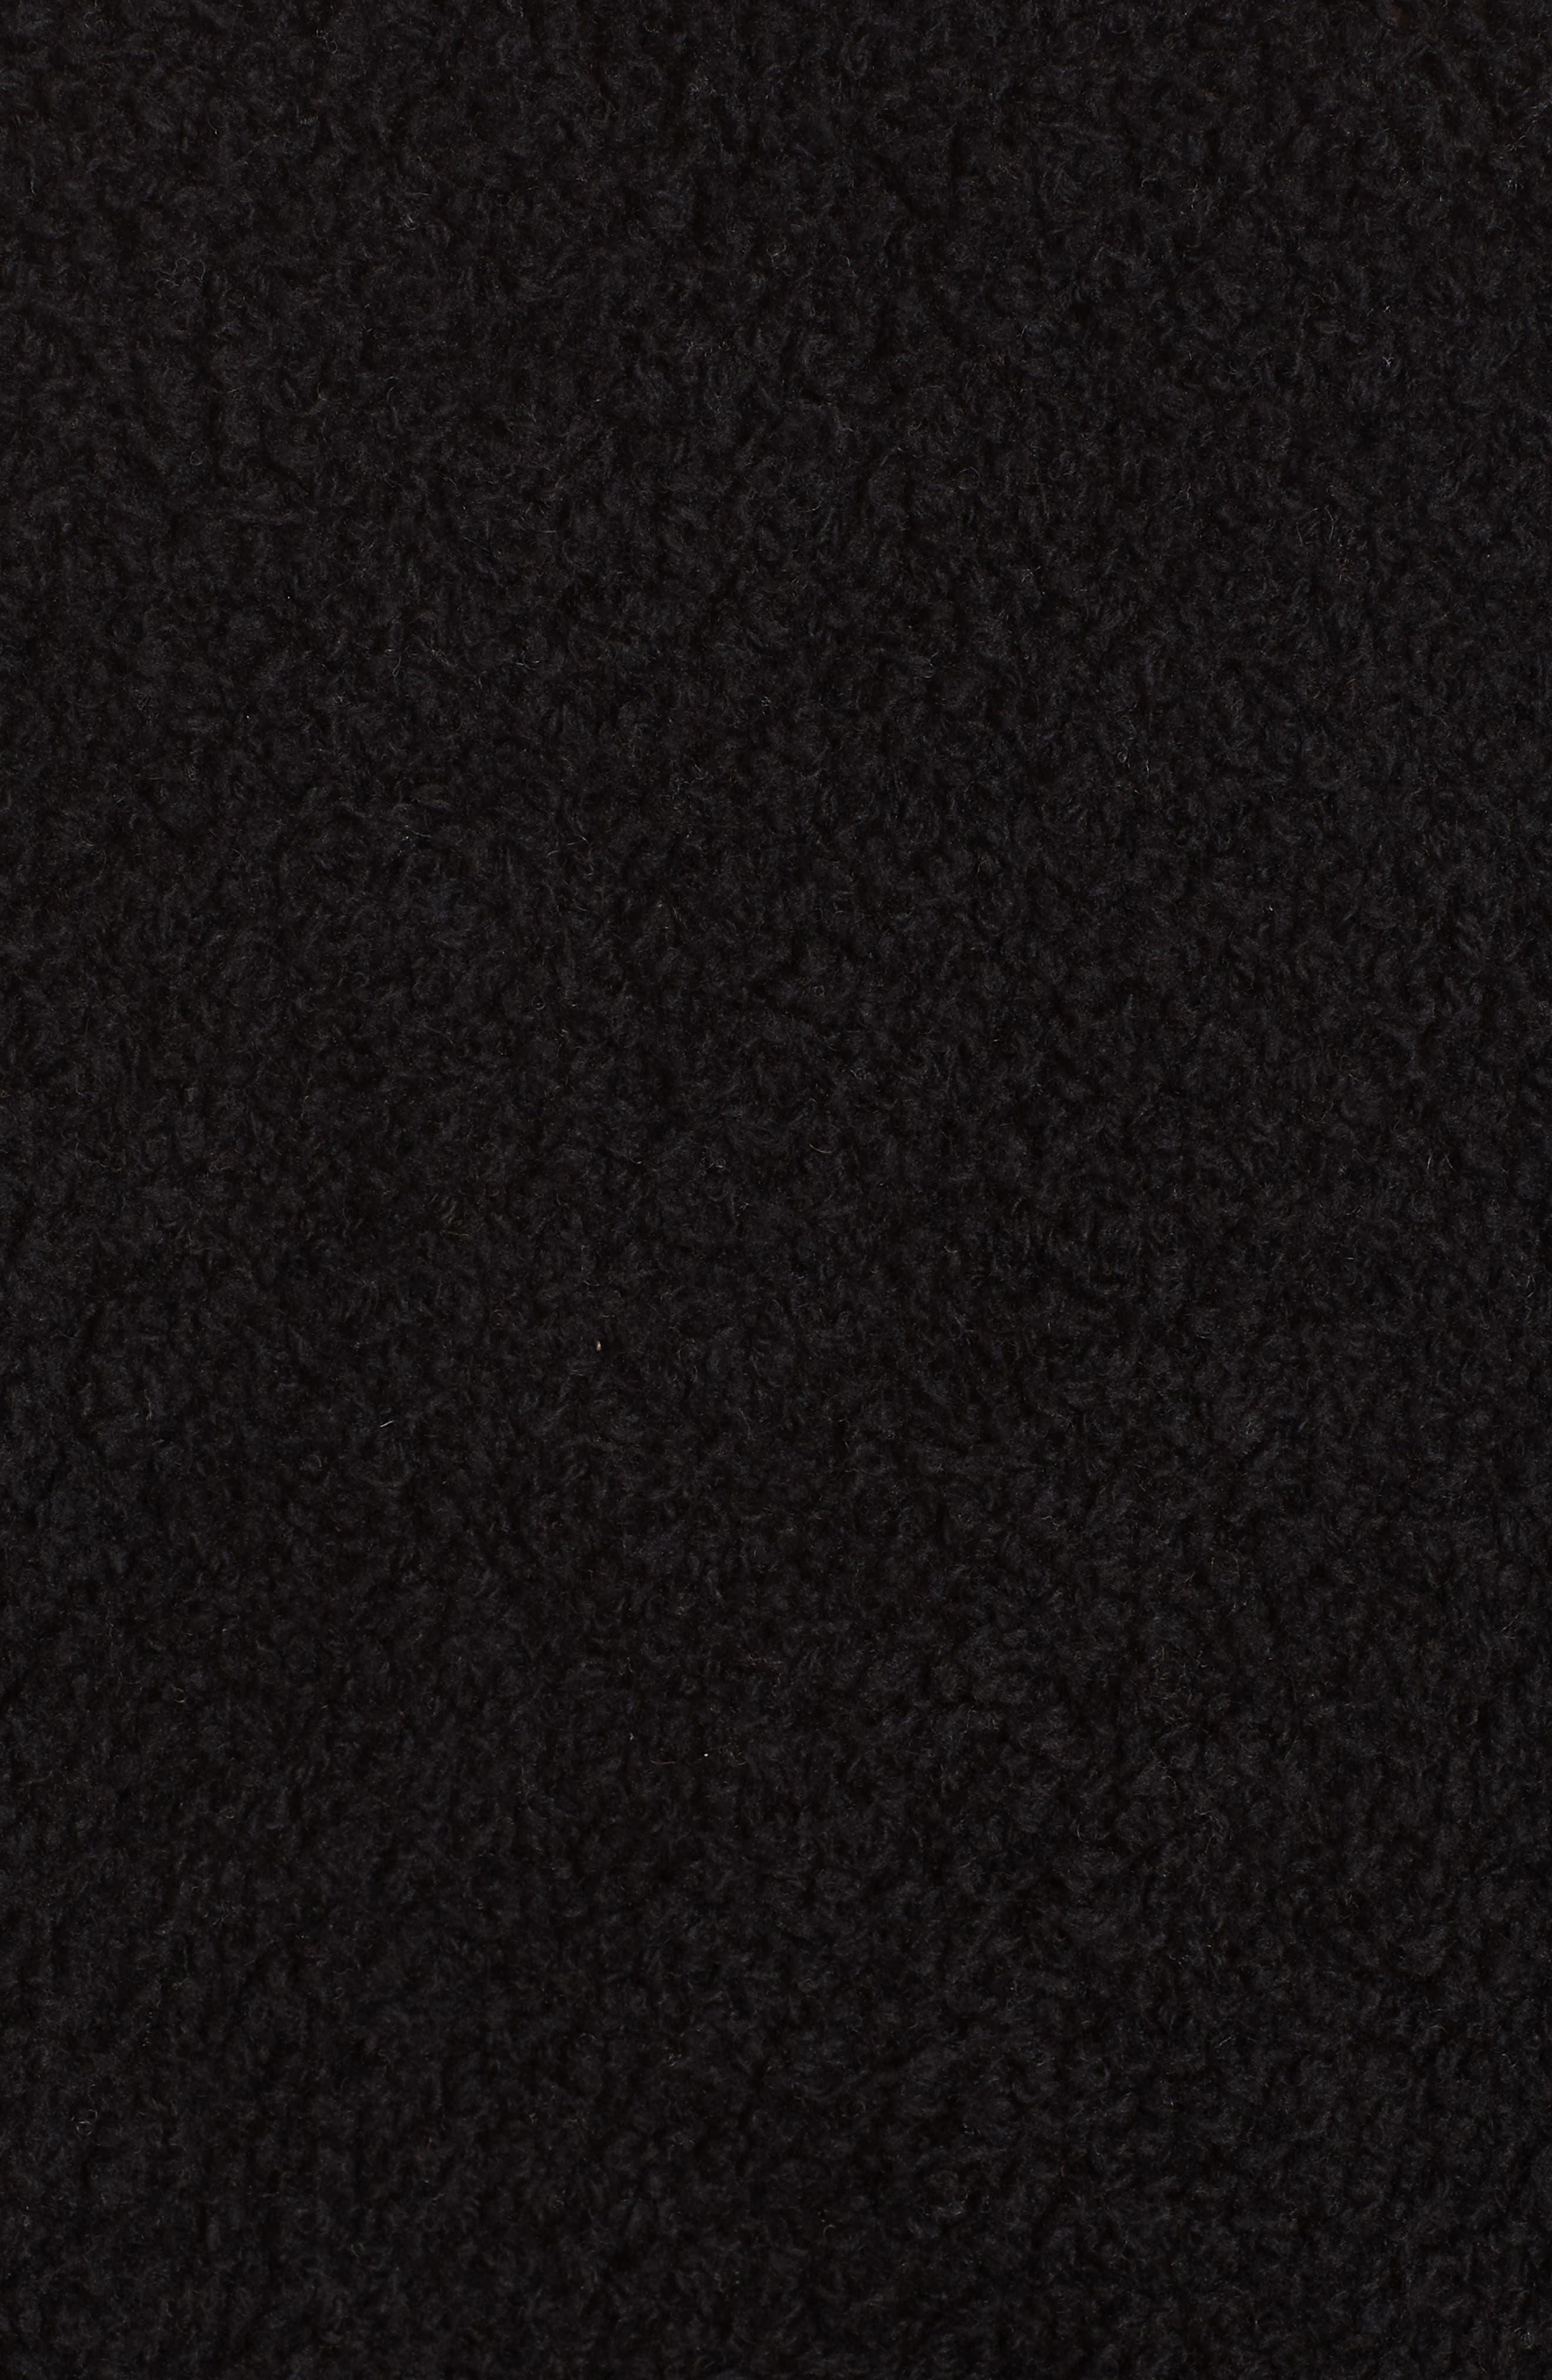 Teddy Wool Blend Cardigan,                             Alternate thumbnail 5, color,                             BLACK